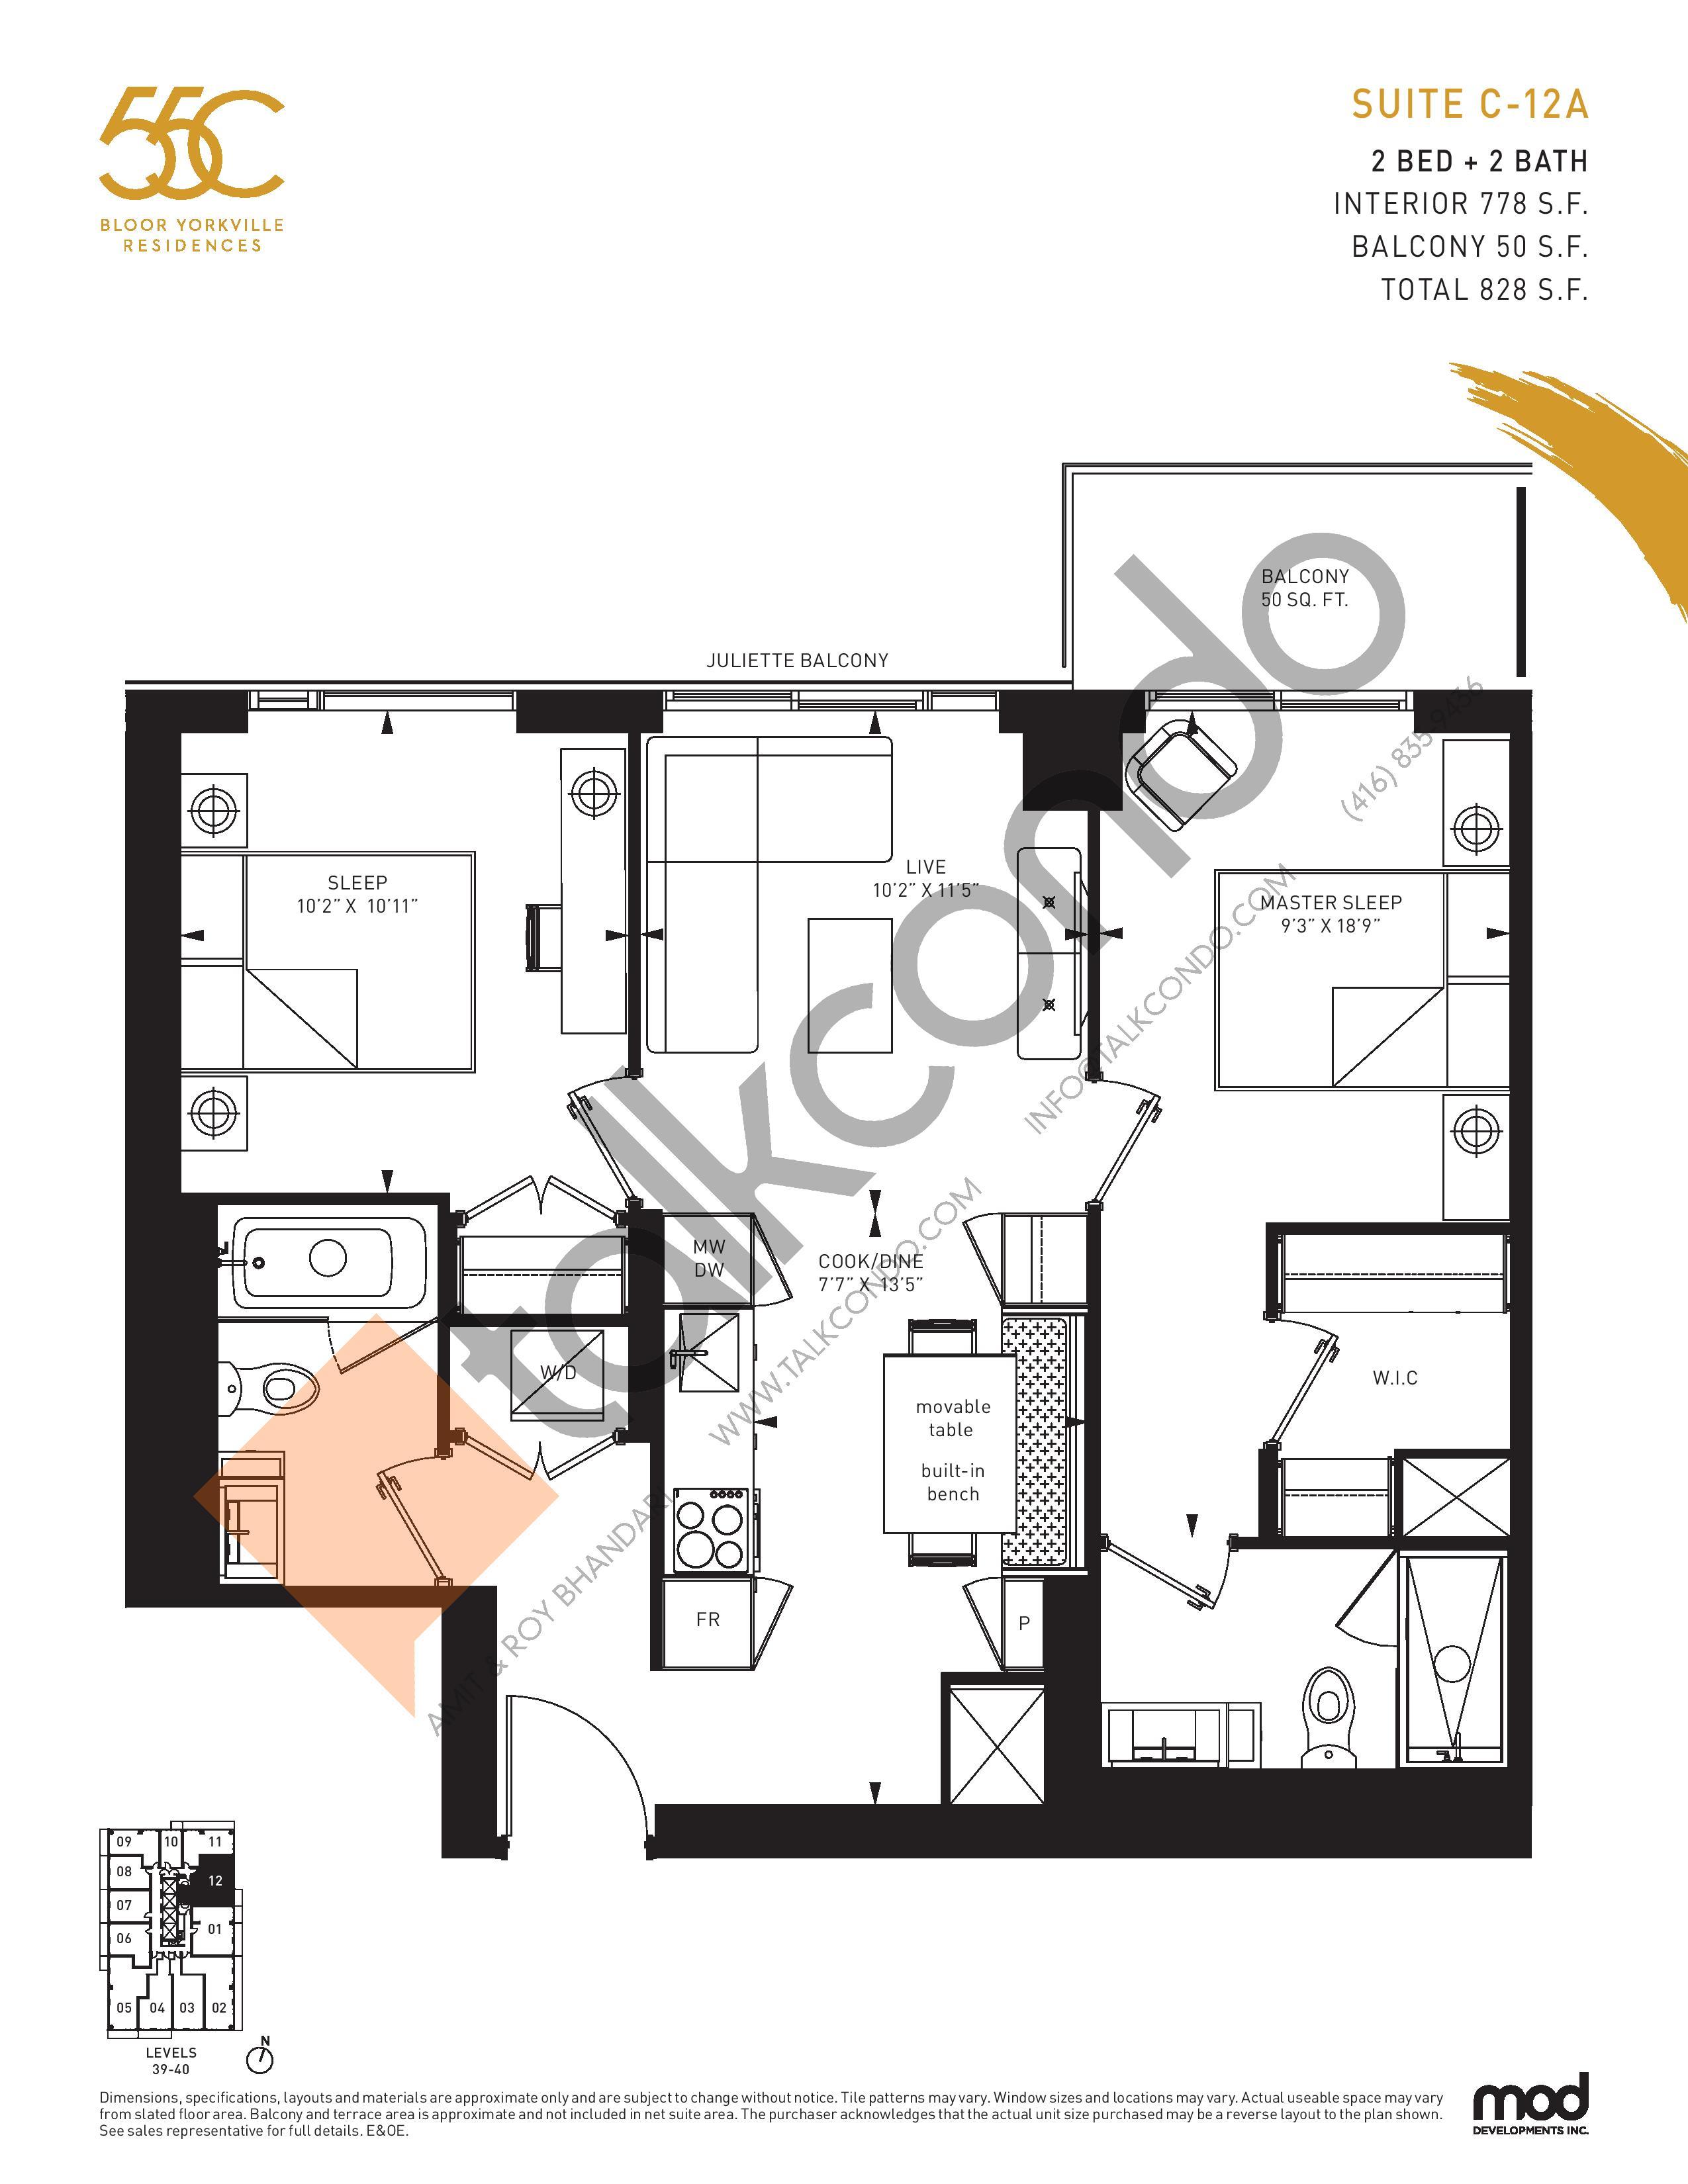 Suite C-12A Floor Plan at 55C Condos - 778 sq.ft